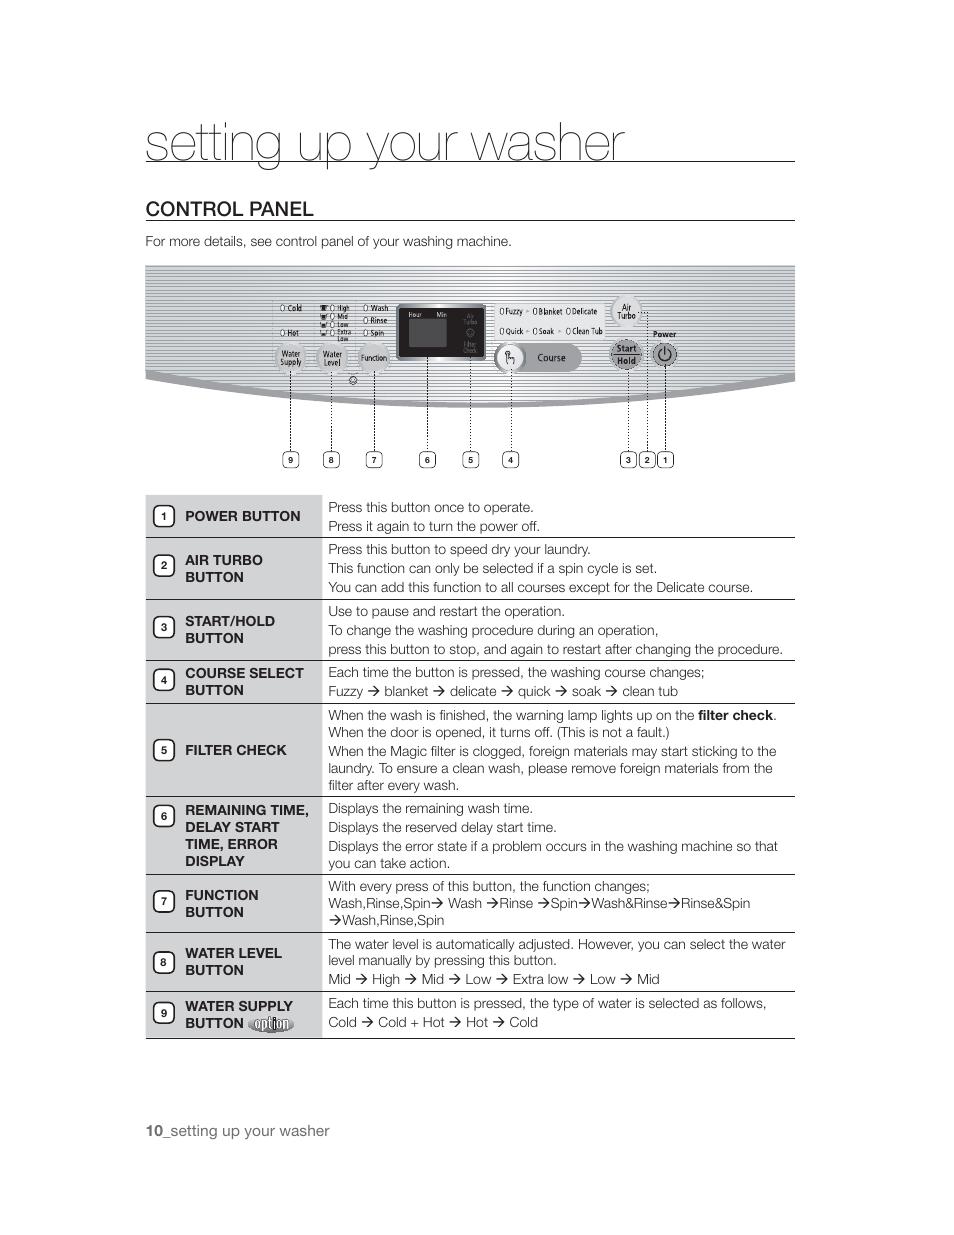 rotting up your warhnr control panel samsung wa85u3 user manual rh manualsdir com Samsung Refrigerator RF4287HARS Manual Samsung Parts Manuals